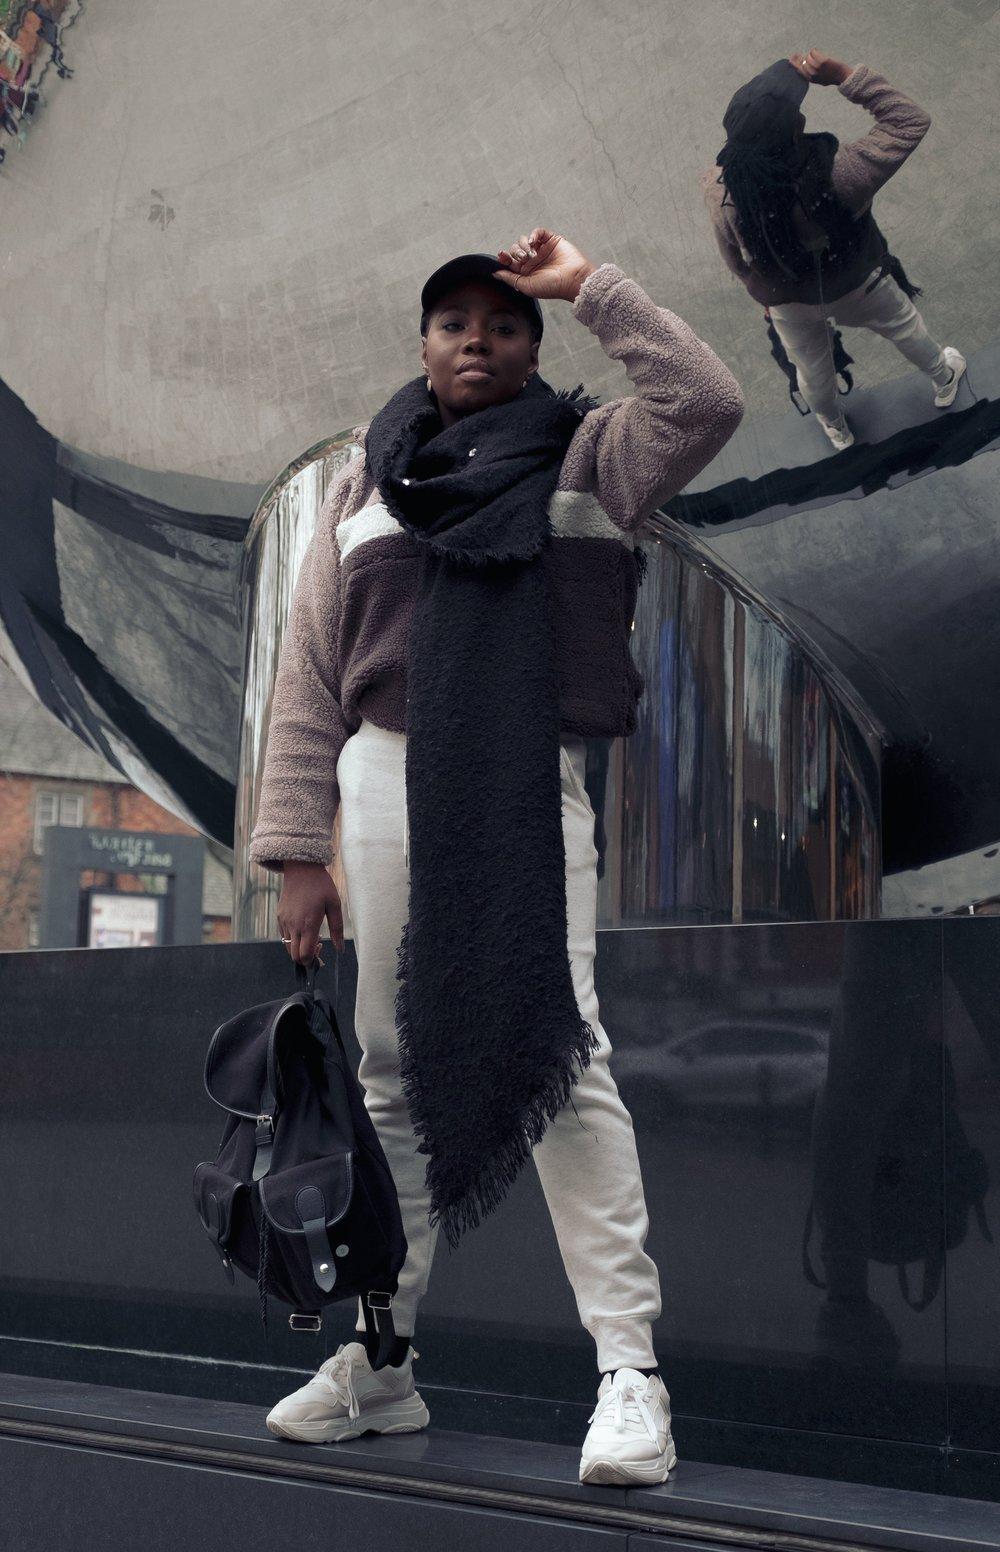 Cold+But+Make+It+Fashion